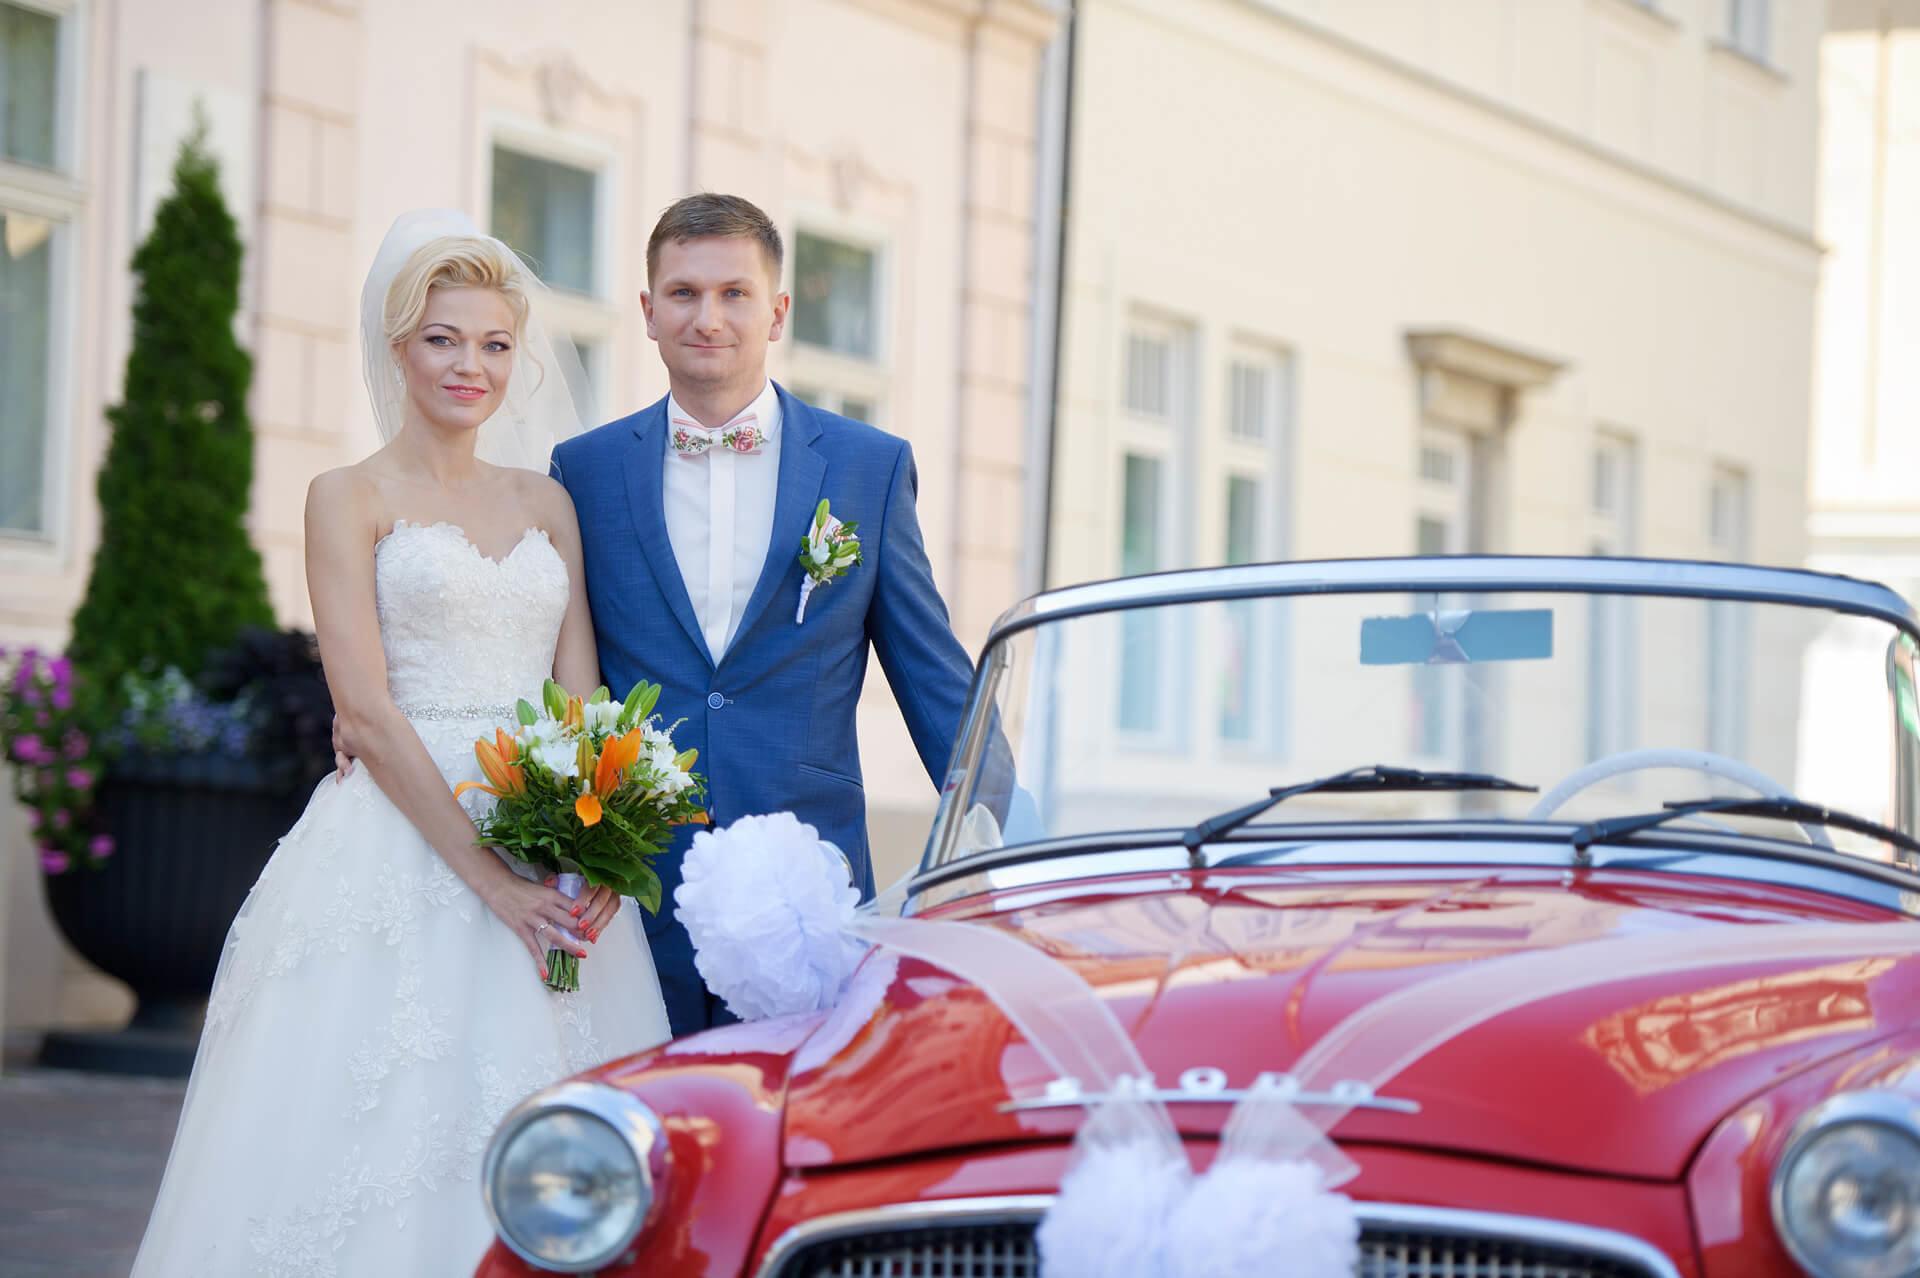 svadba svadobny portrety profesionalne fotenie fotograf Peter Norulak Kosice__44